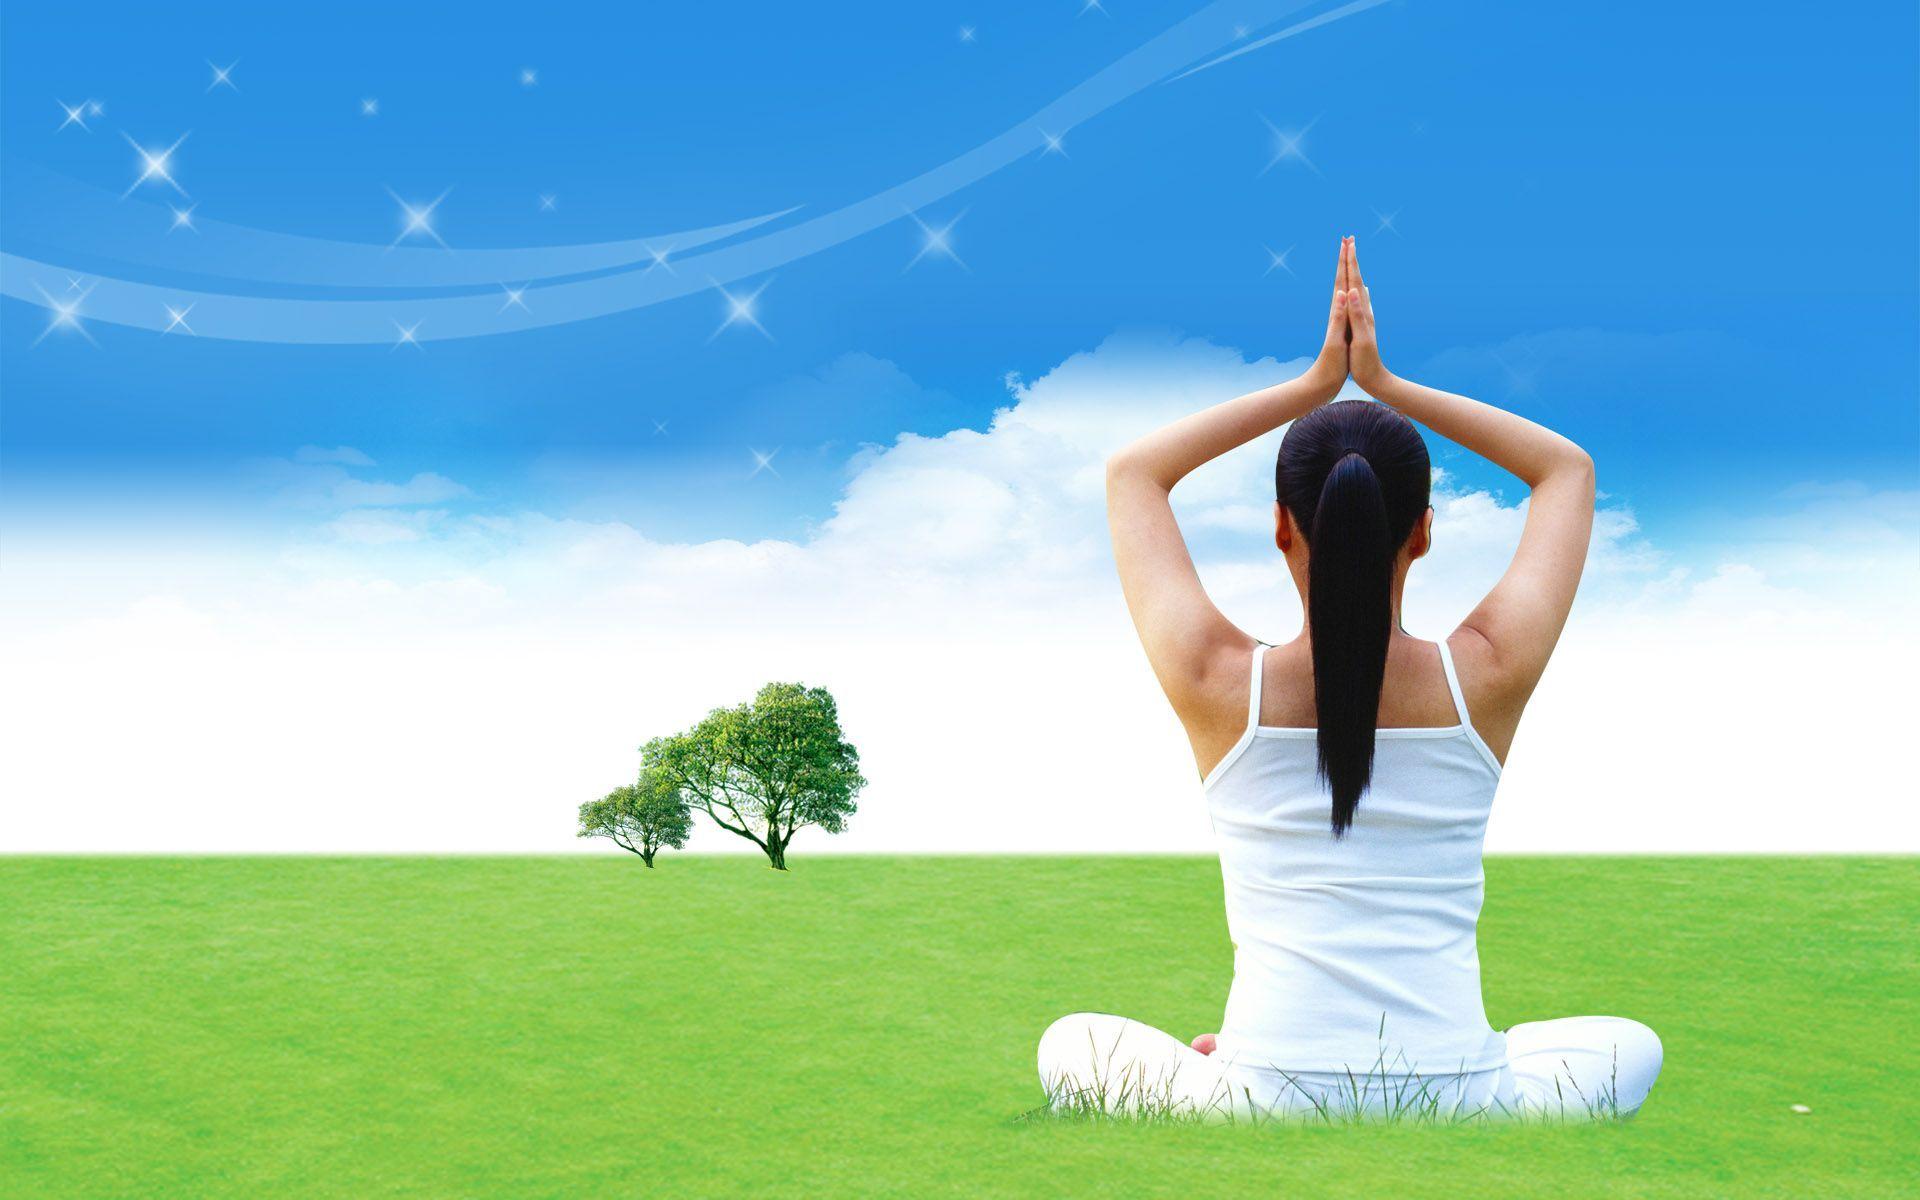 yogadaywallpapers International yoga day, Yoga day